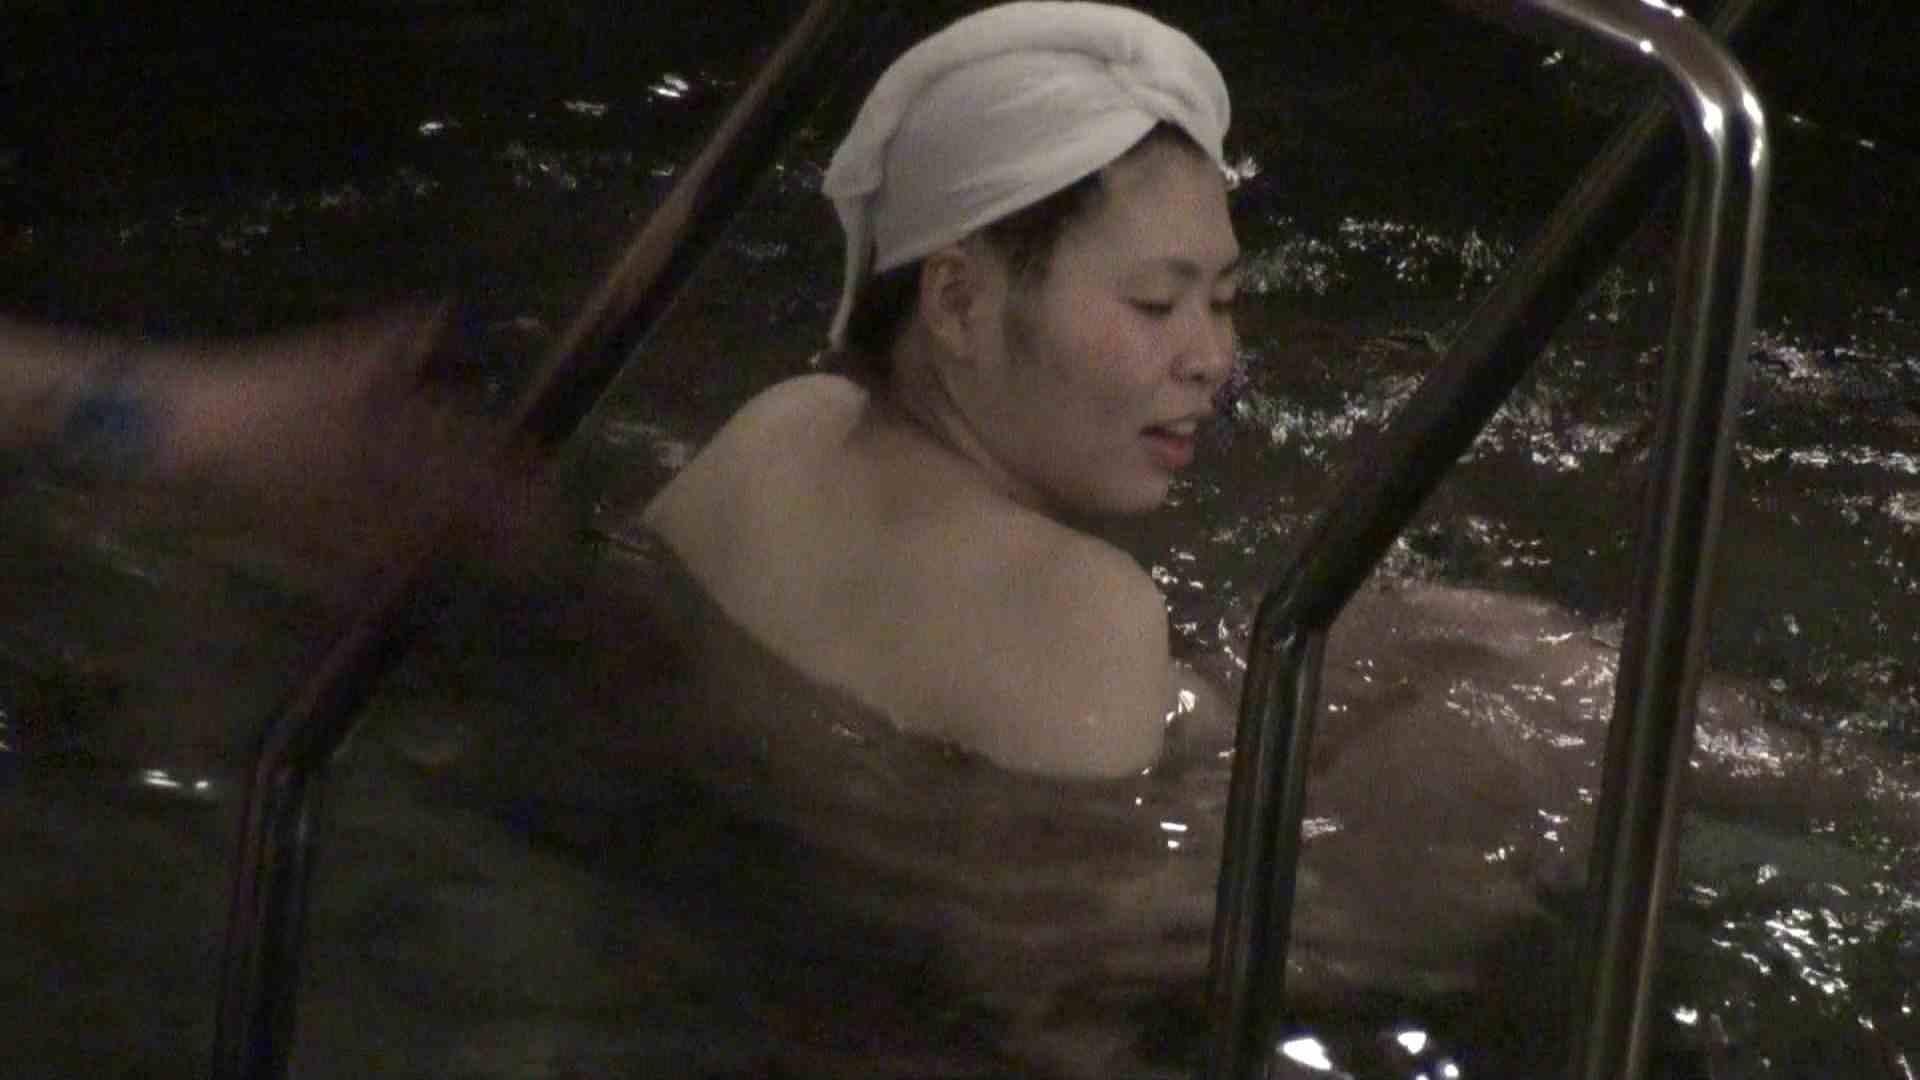 Aquaな露天風呂Vol.401 OLすけべ画像 | 盗撮  95連発 7